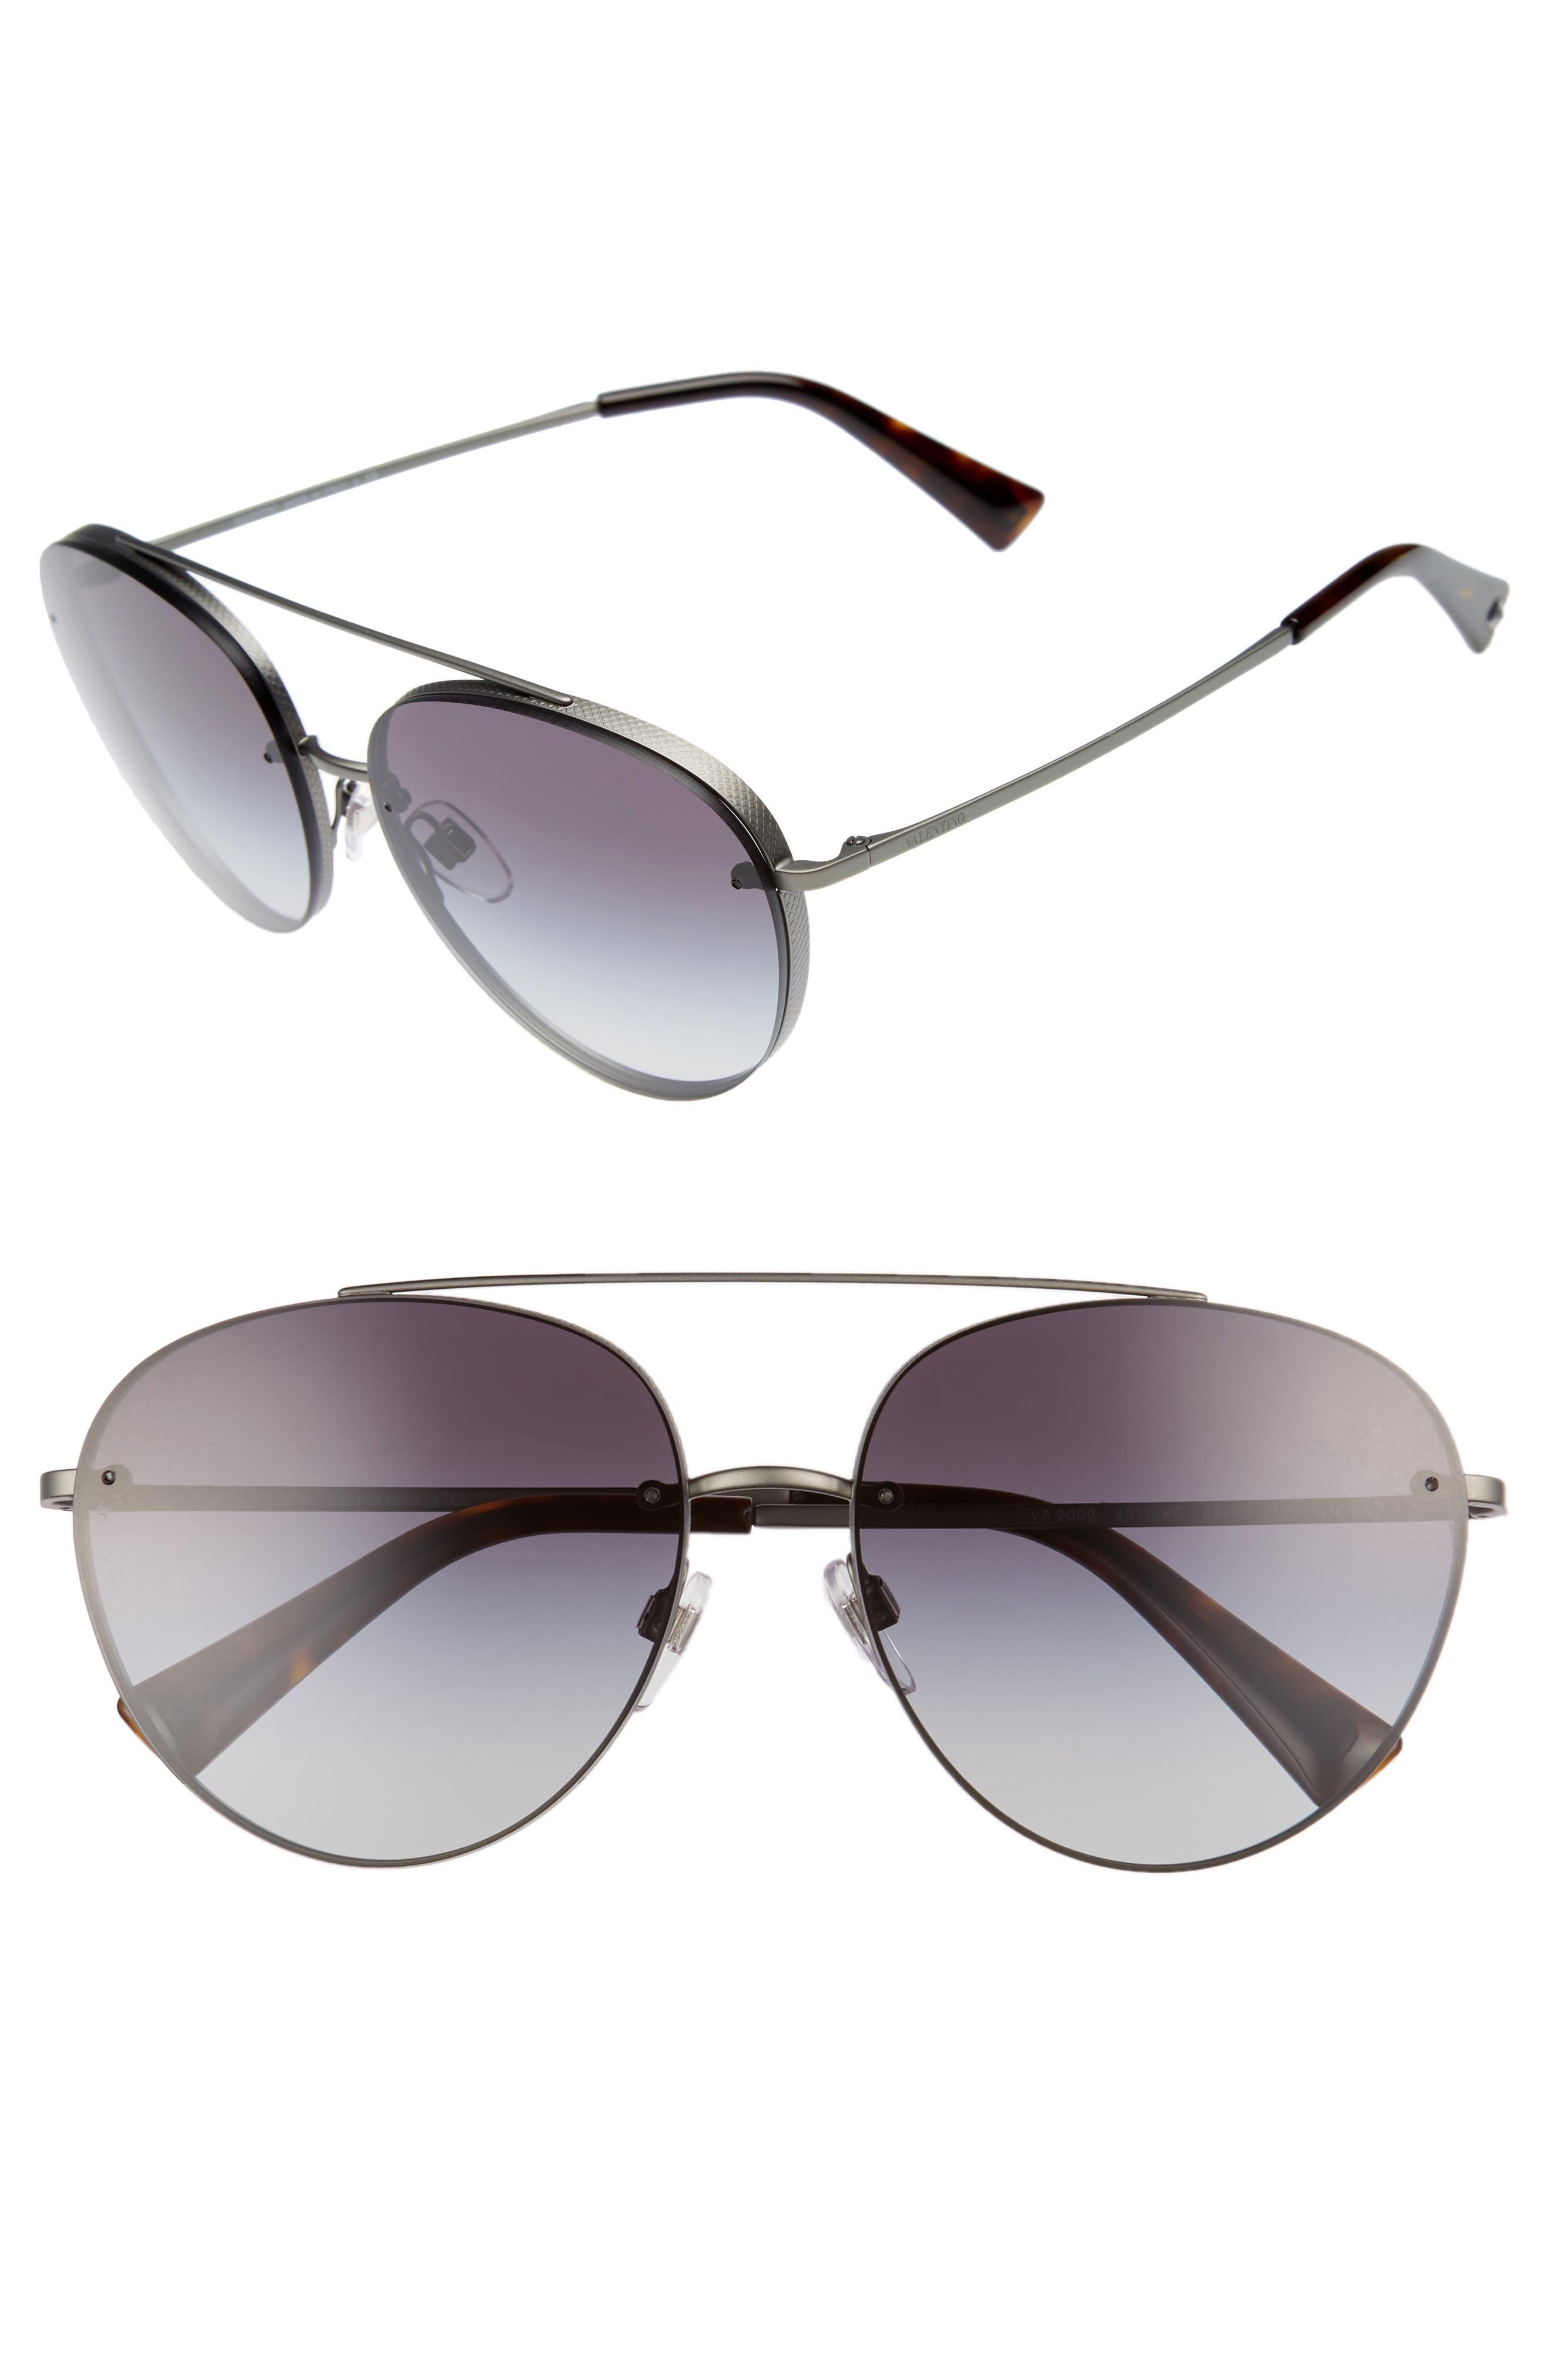 VALENTINO GARAVANI Valentino 58mm Gradient Aviator Sunglasses